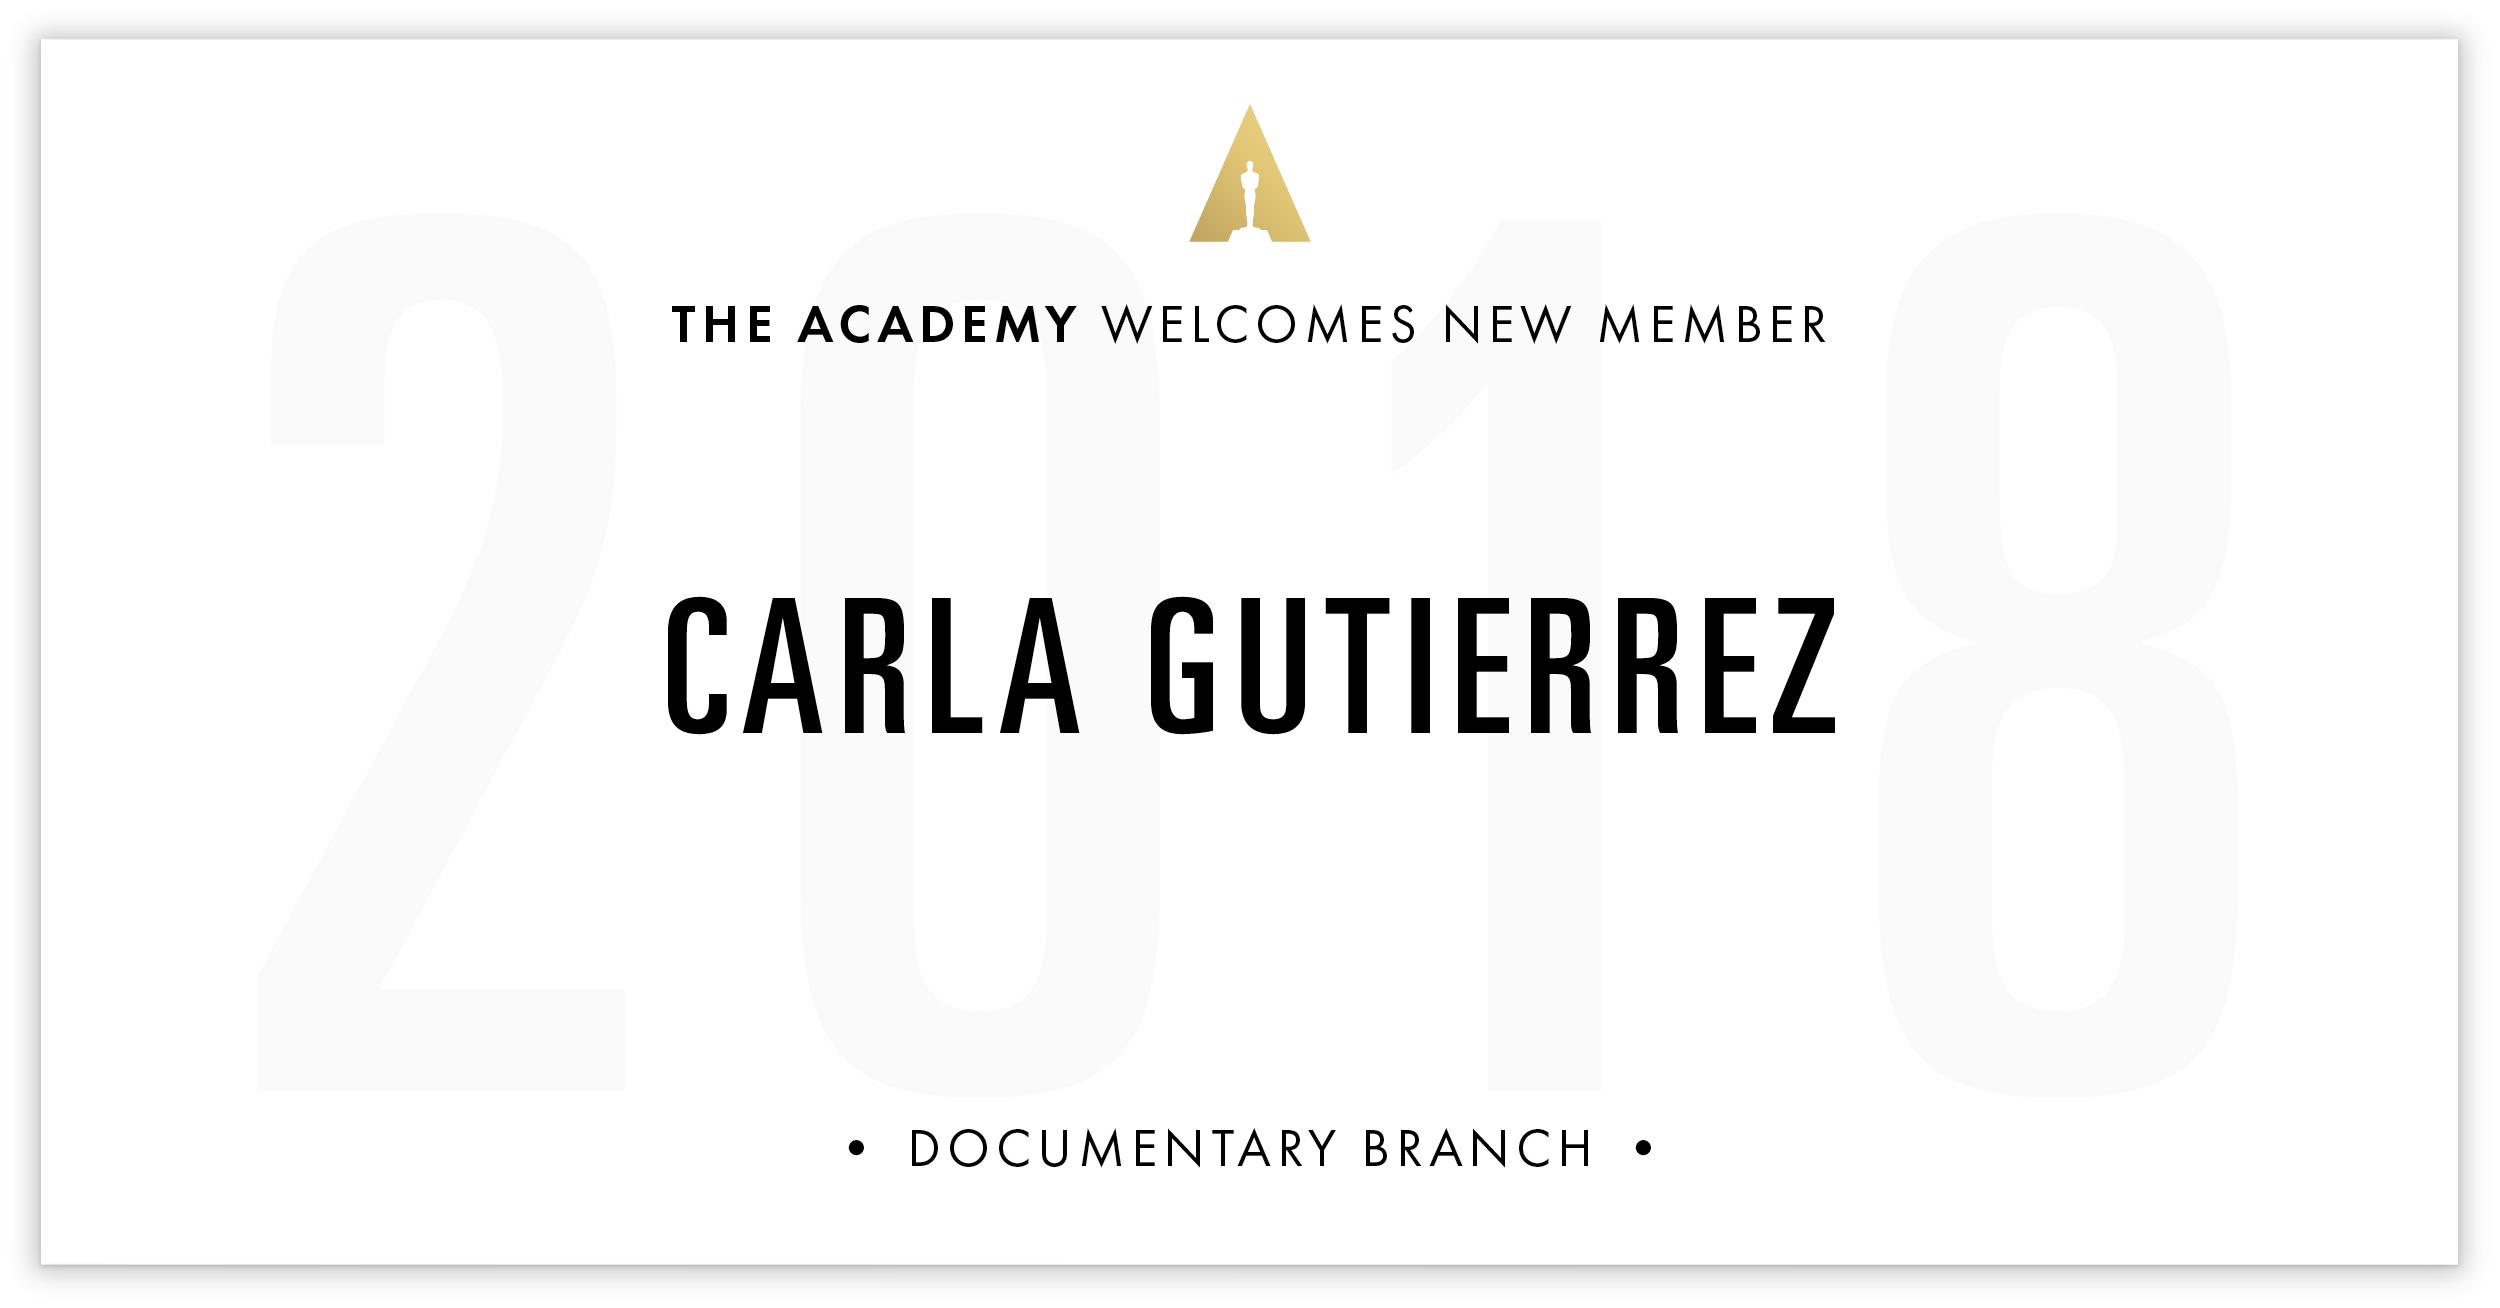 Carla Gutierrez is invited!